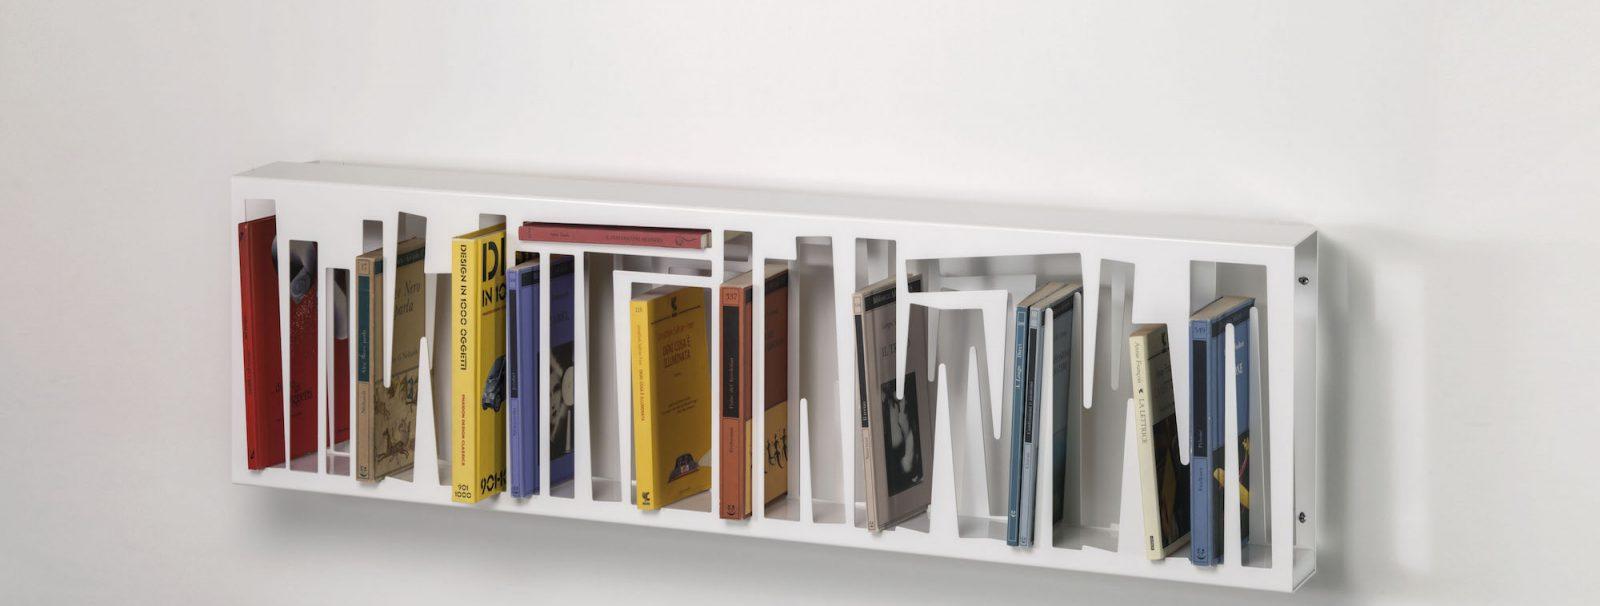 Bookshape Modulus